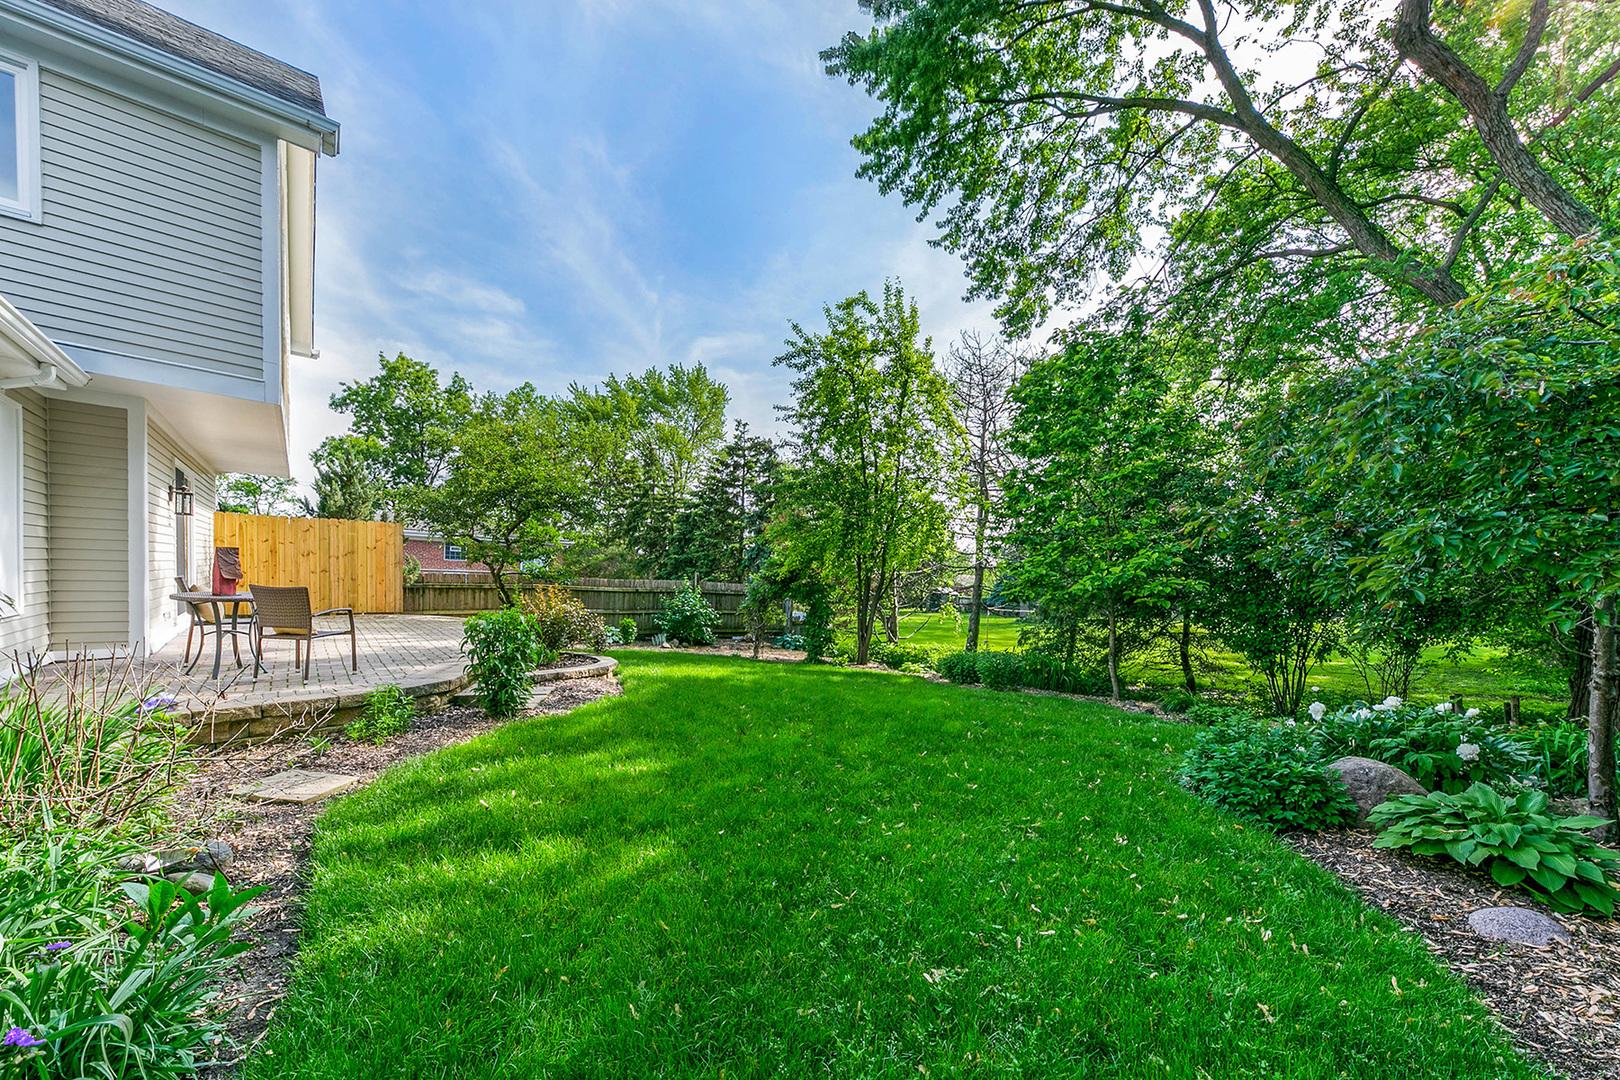 36 Dorset, Glen Ellyn, Illinois, 60137